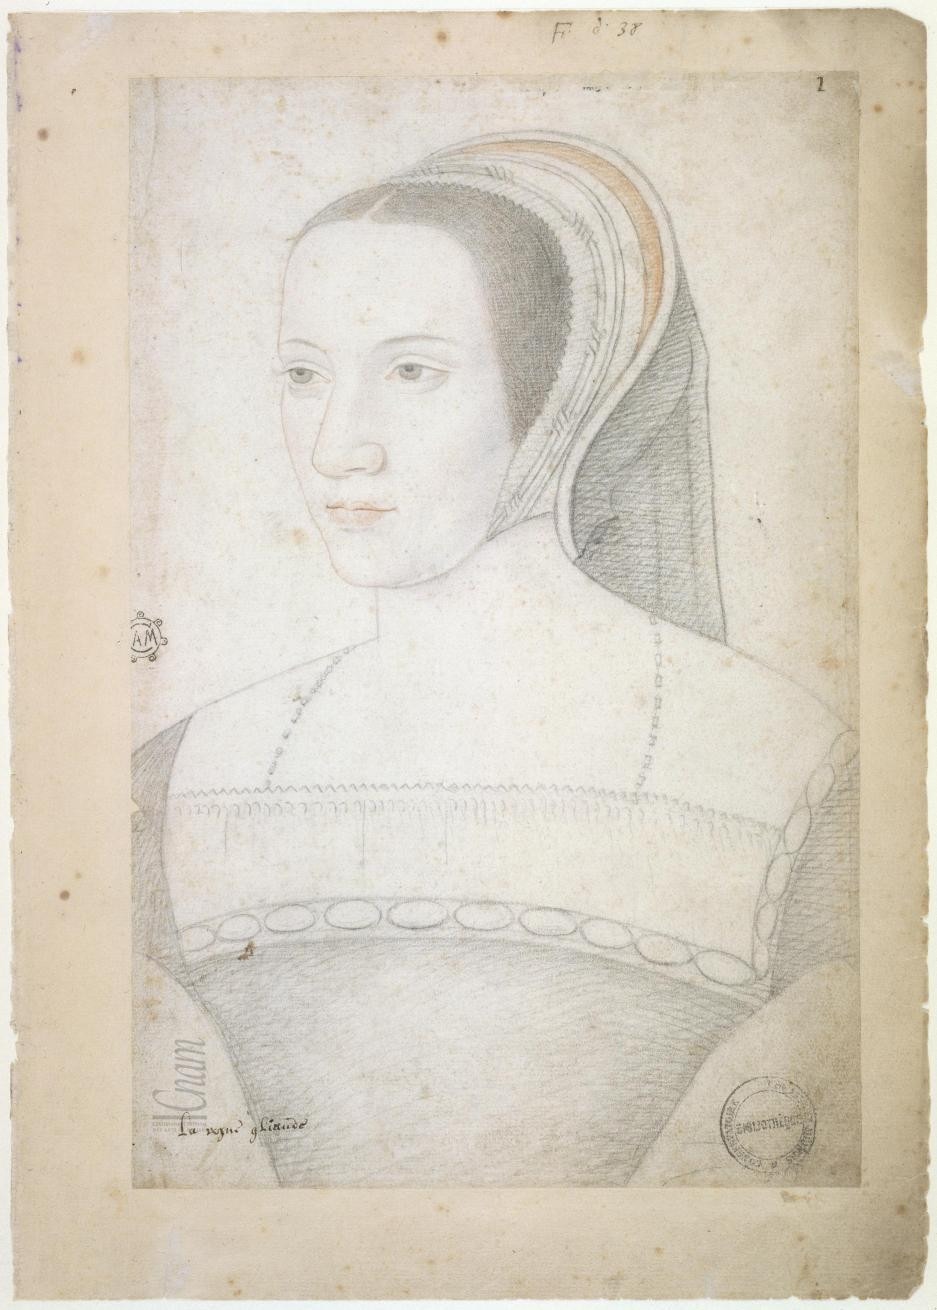 1520 (approx) - Claude de France